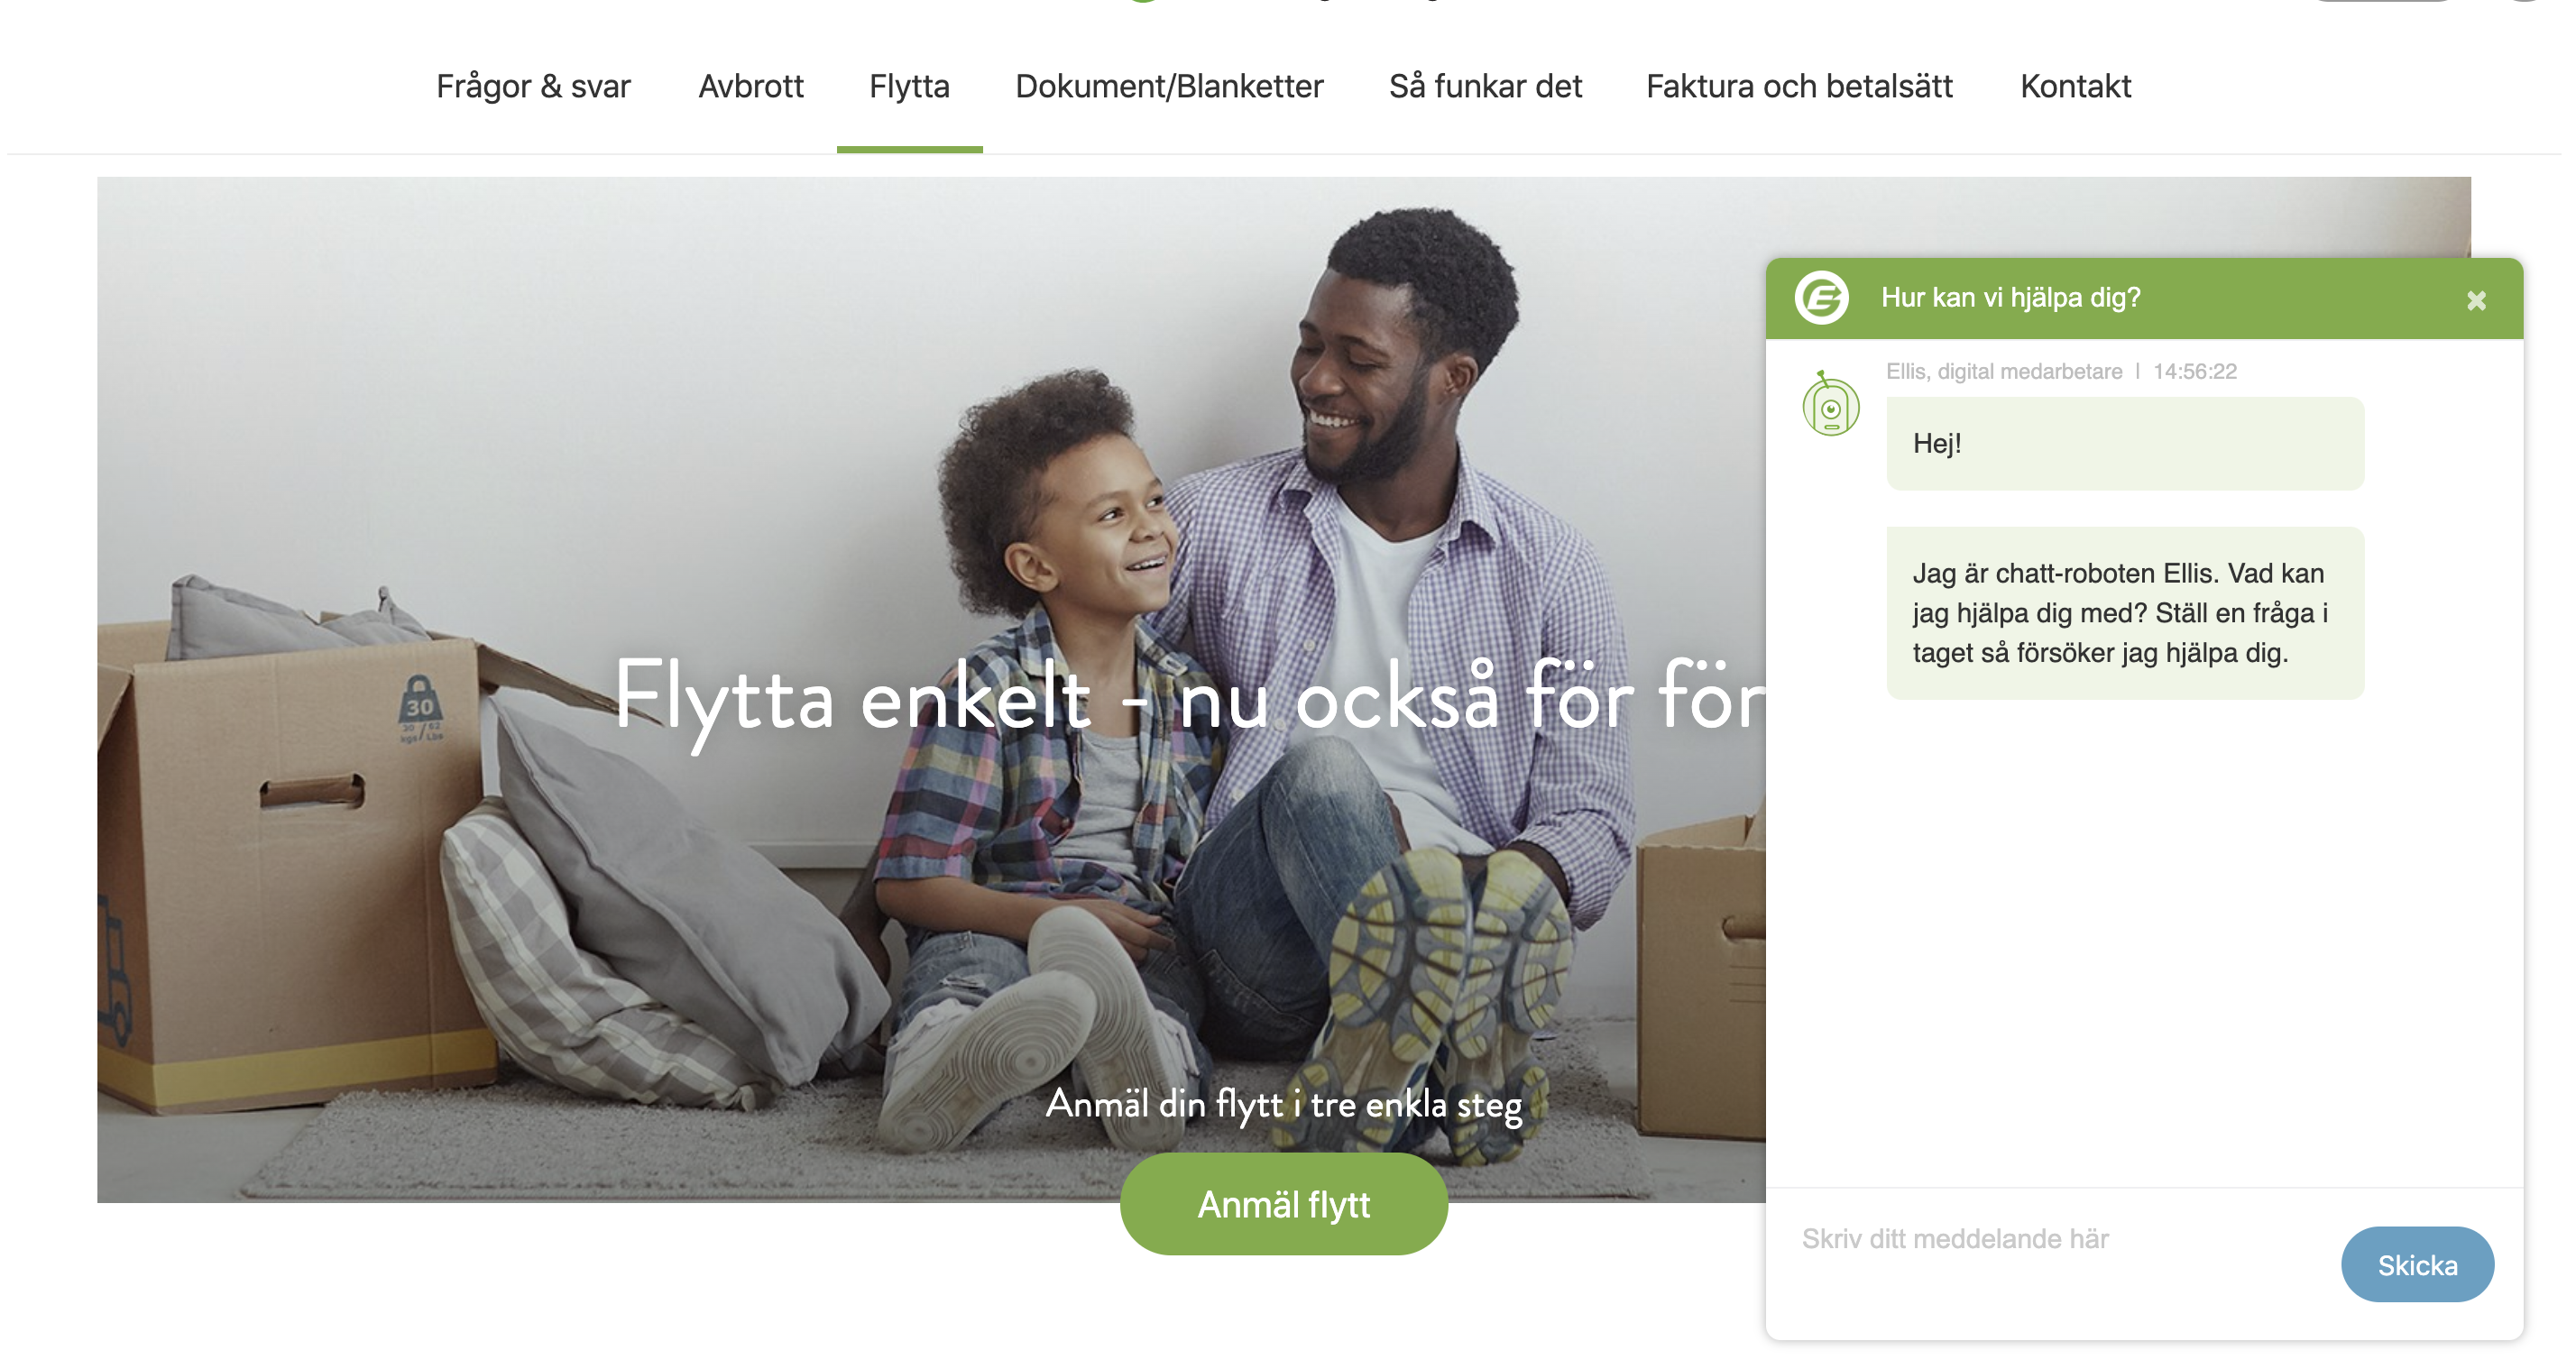 Göteborg Energi using GetJenny chatbot to automate customer service